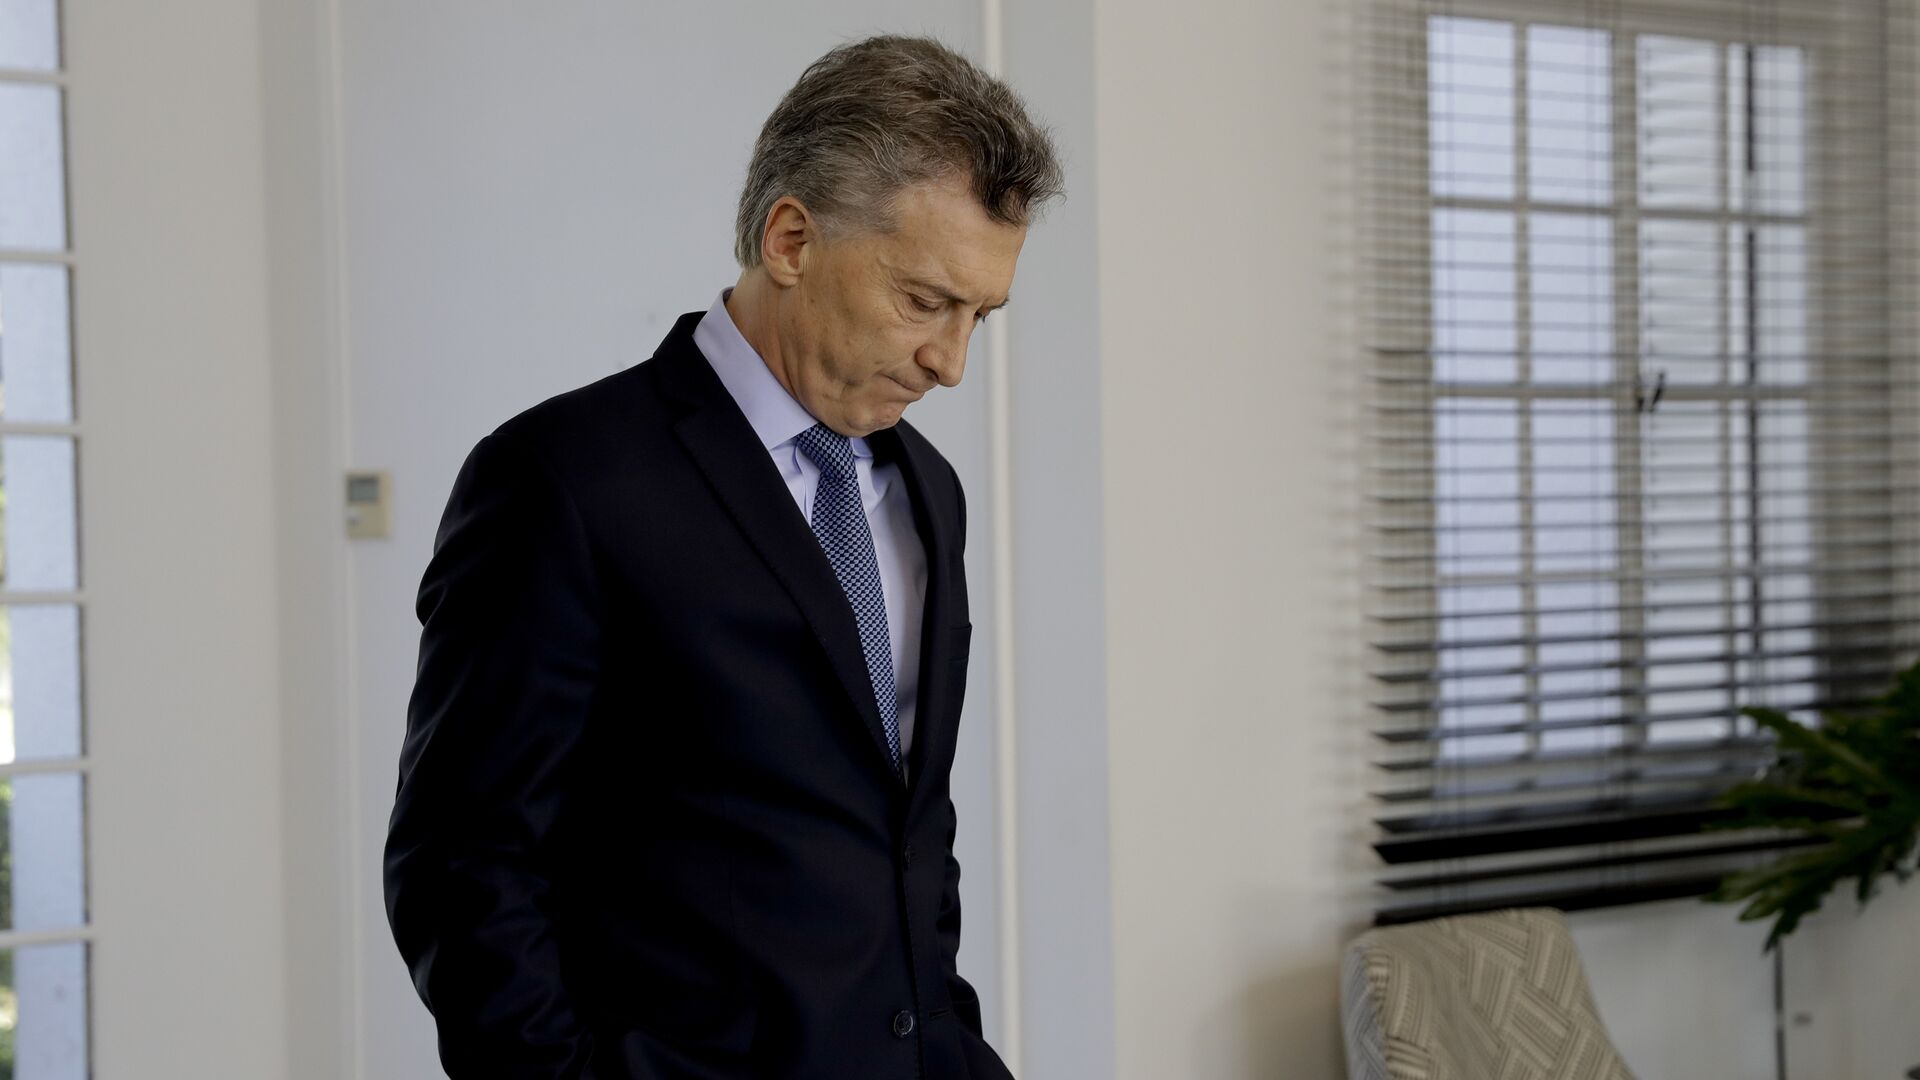 Mauricio Macri, presidente de Argentina - Sputnik Mundo, 1920, 13.03.2021